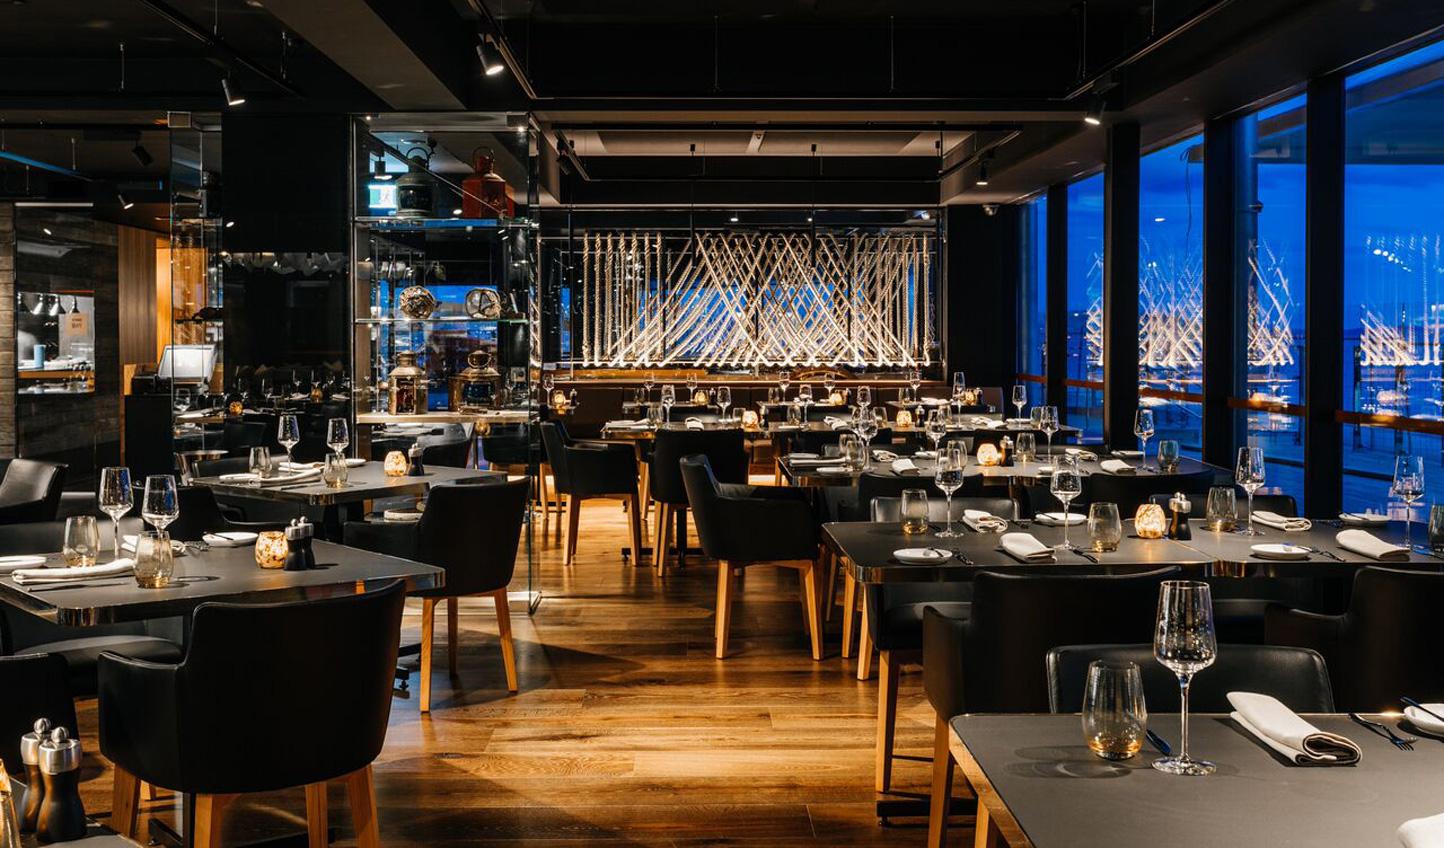 The sleek Old Wharf Restaurant